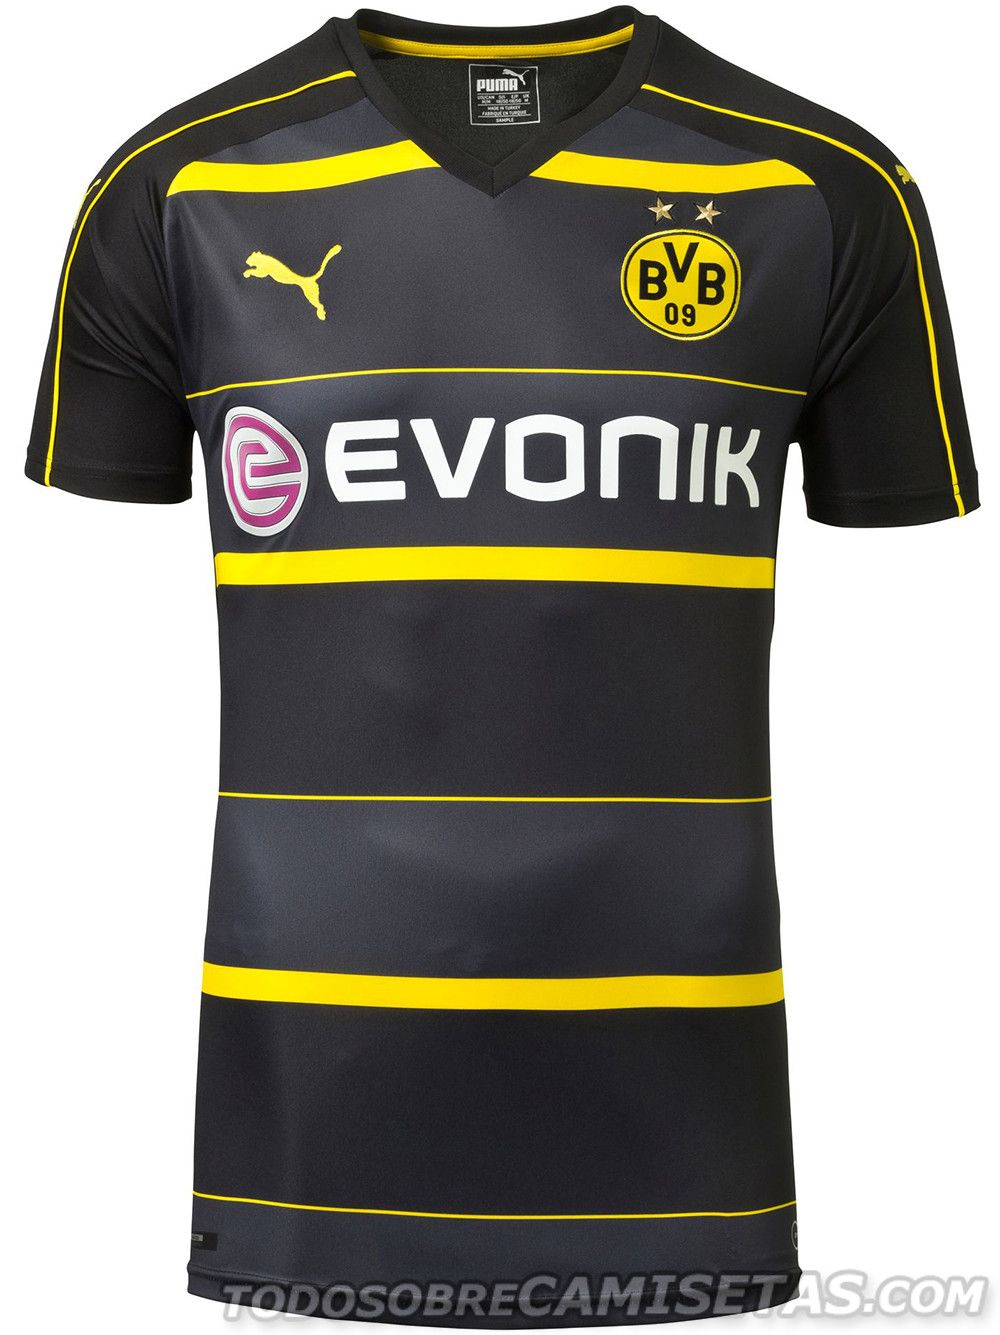 5c8f8c7417 Borussia Dortmund 2016-17 Puma Away Kit